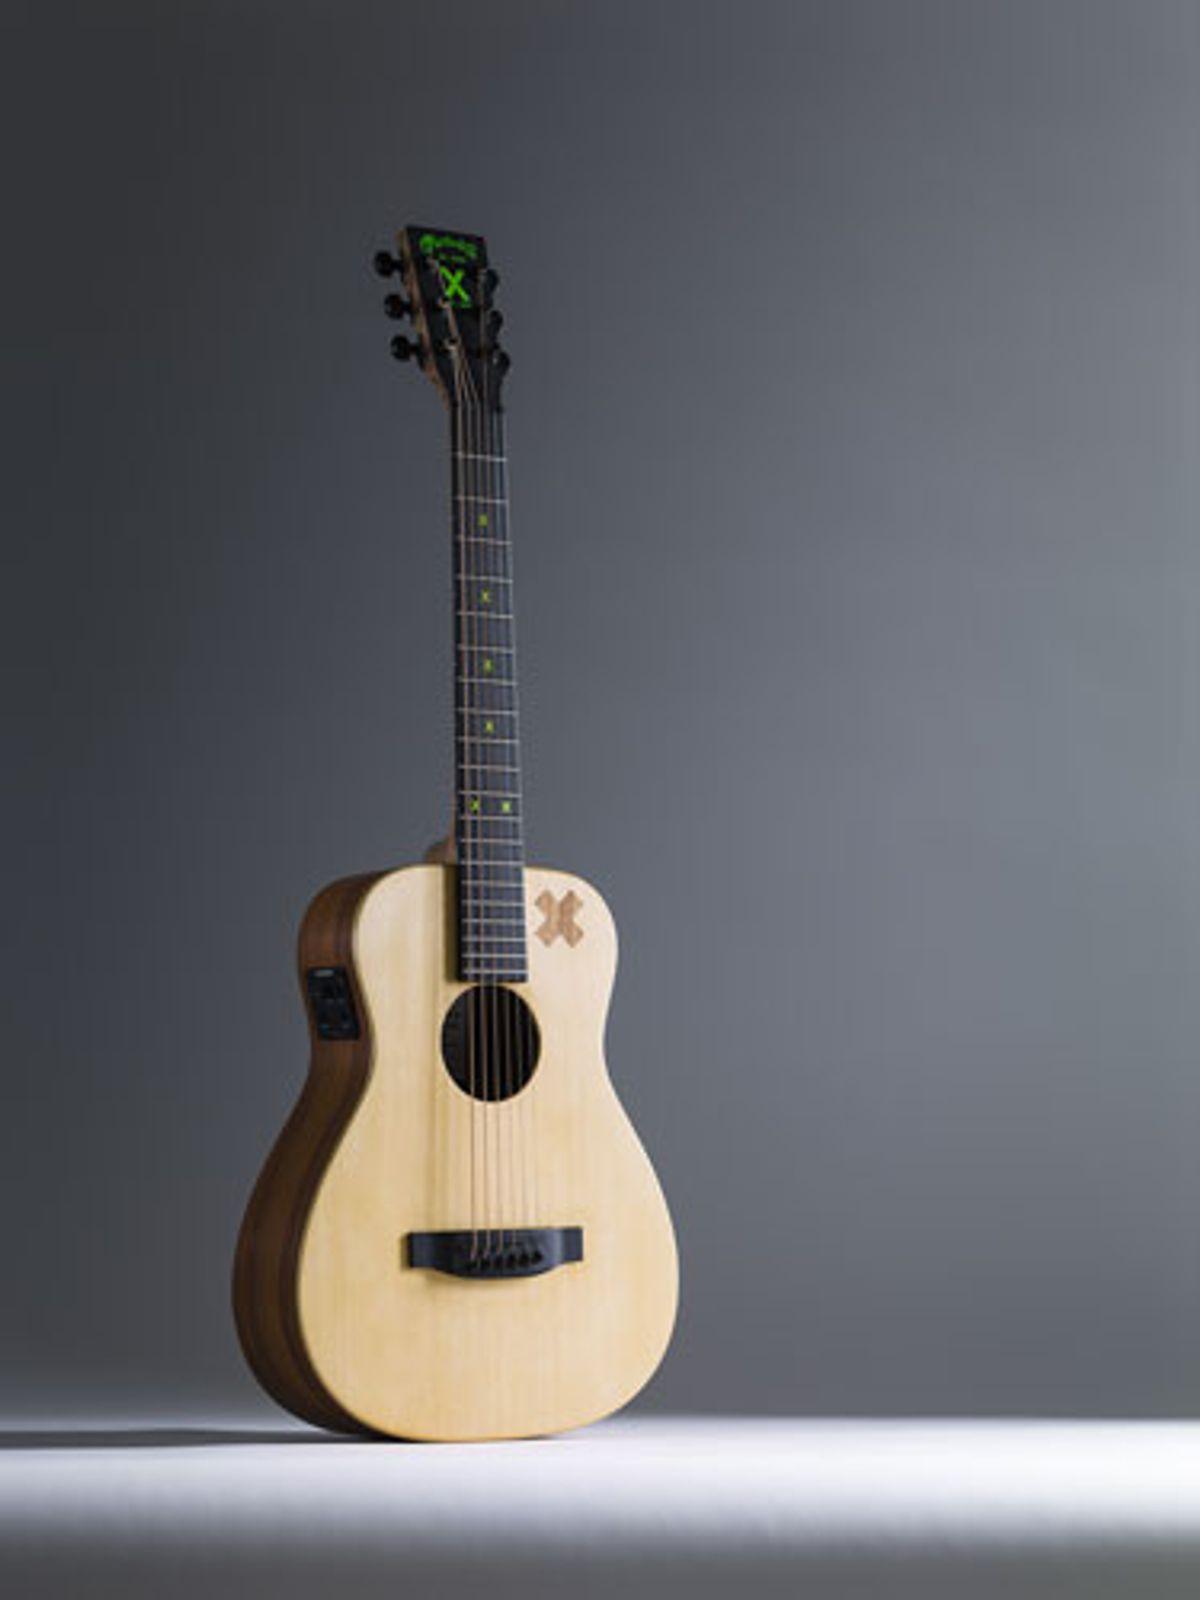 Martin Guitars Announces Ed Sheeran X Signature Edition